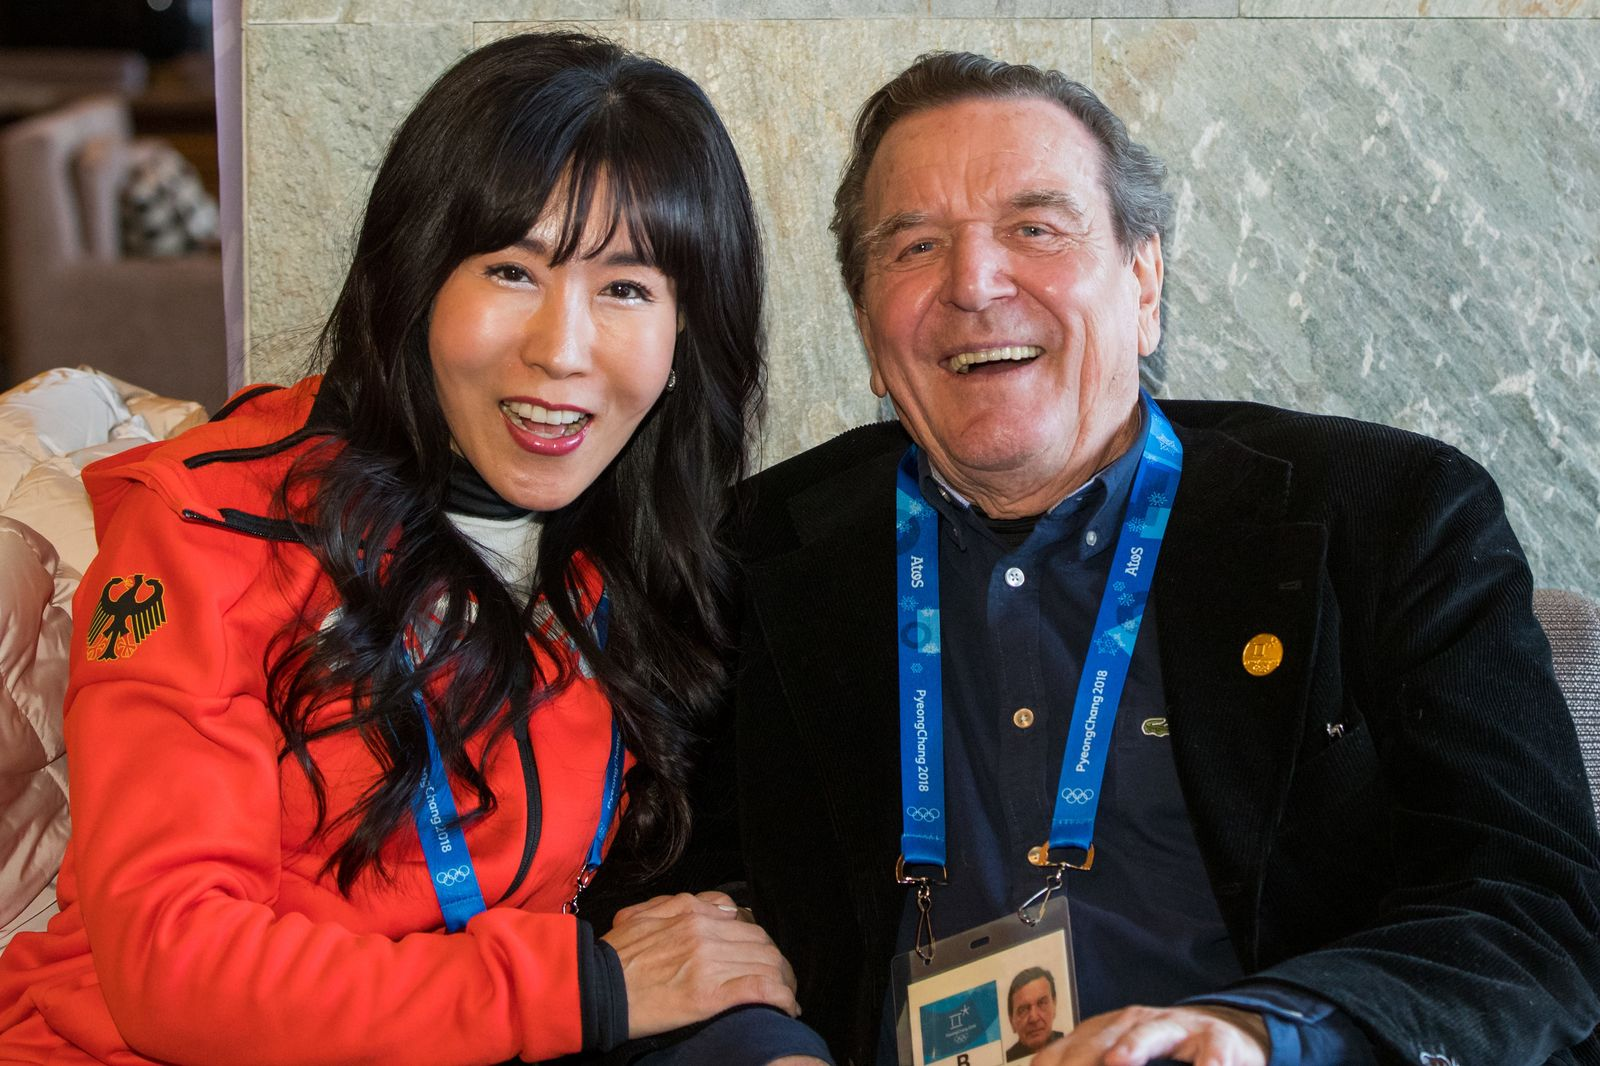 Pyeongchang 2018 - Gerhard Schröder mit Lebensgefährtin